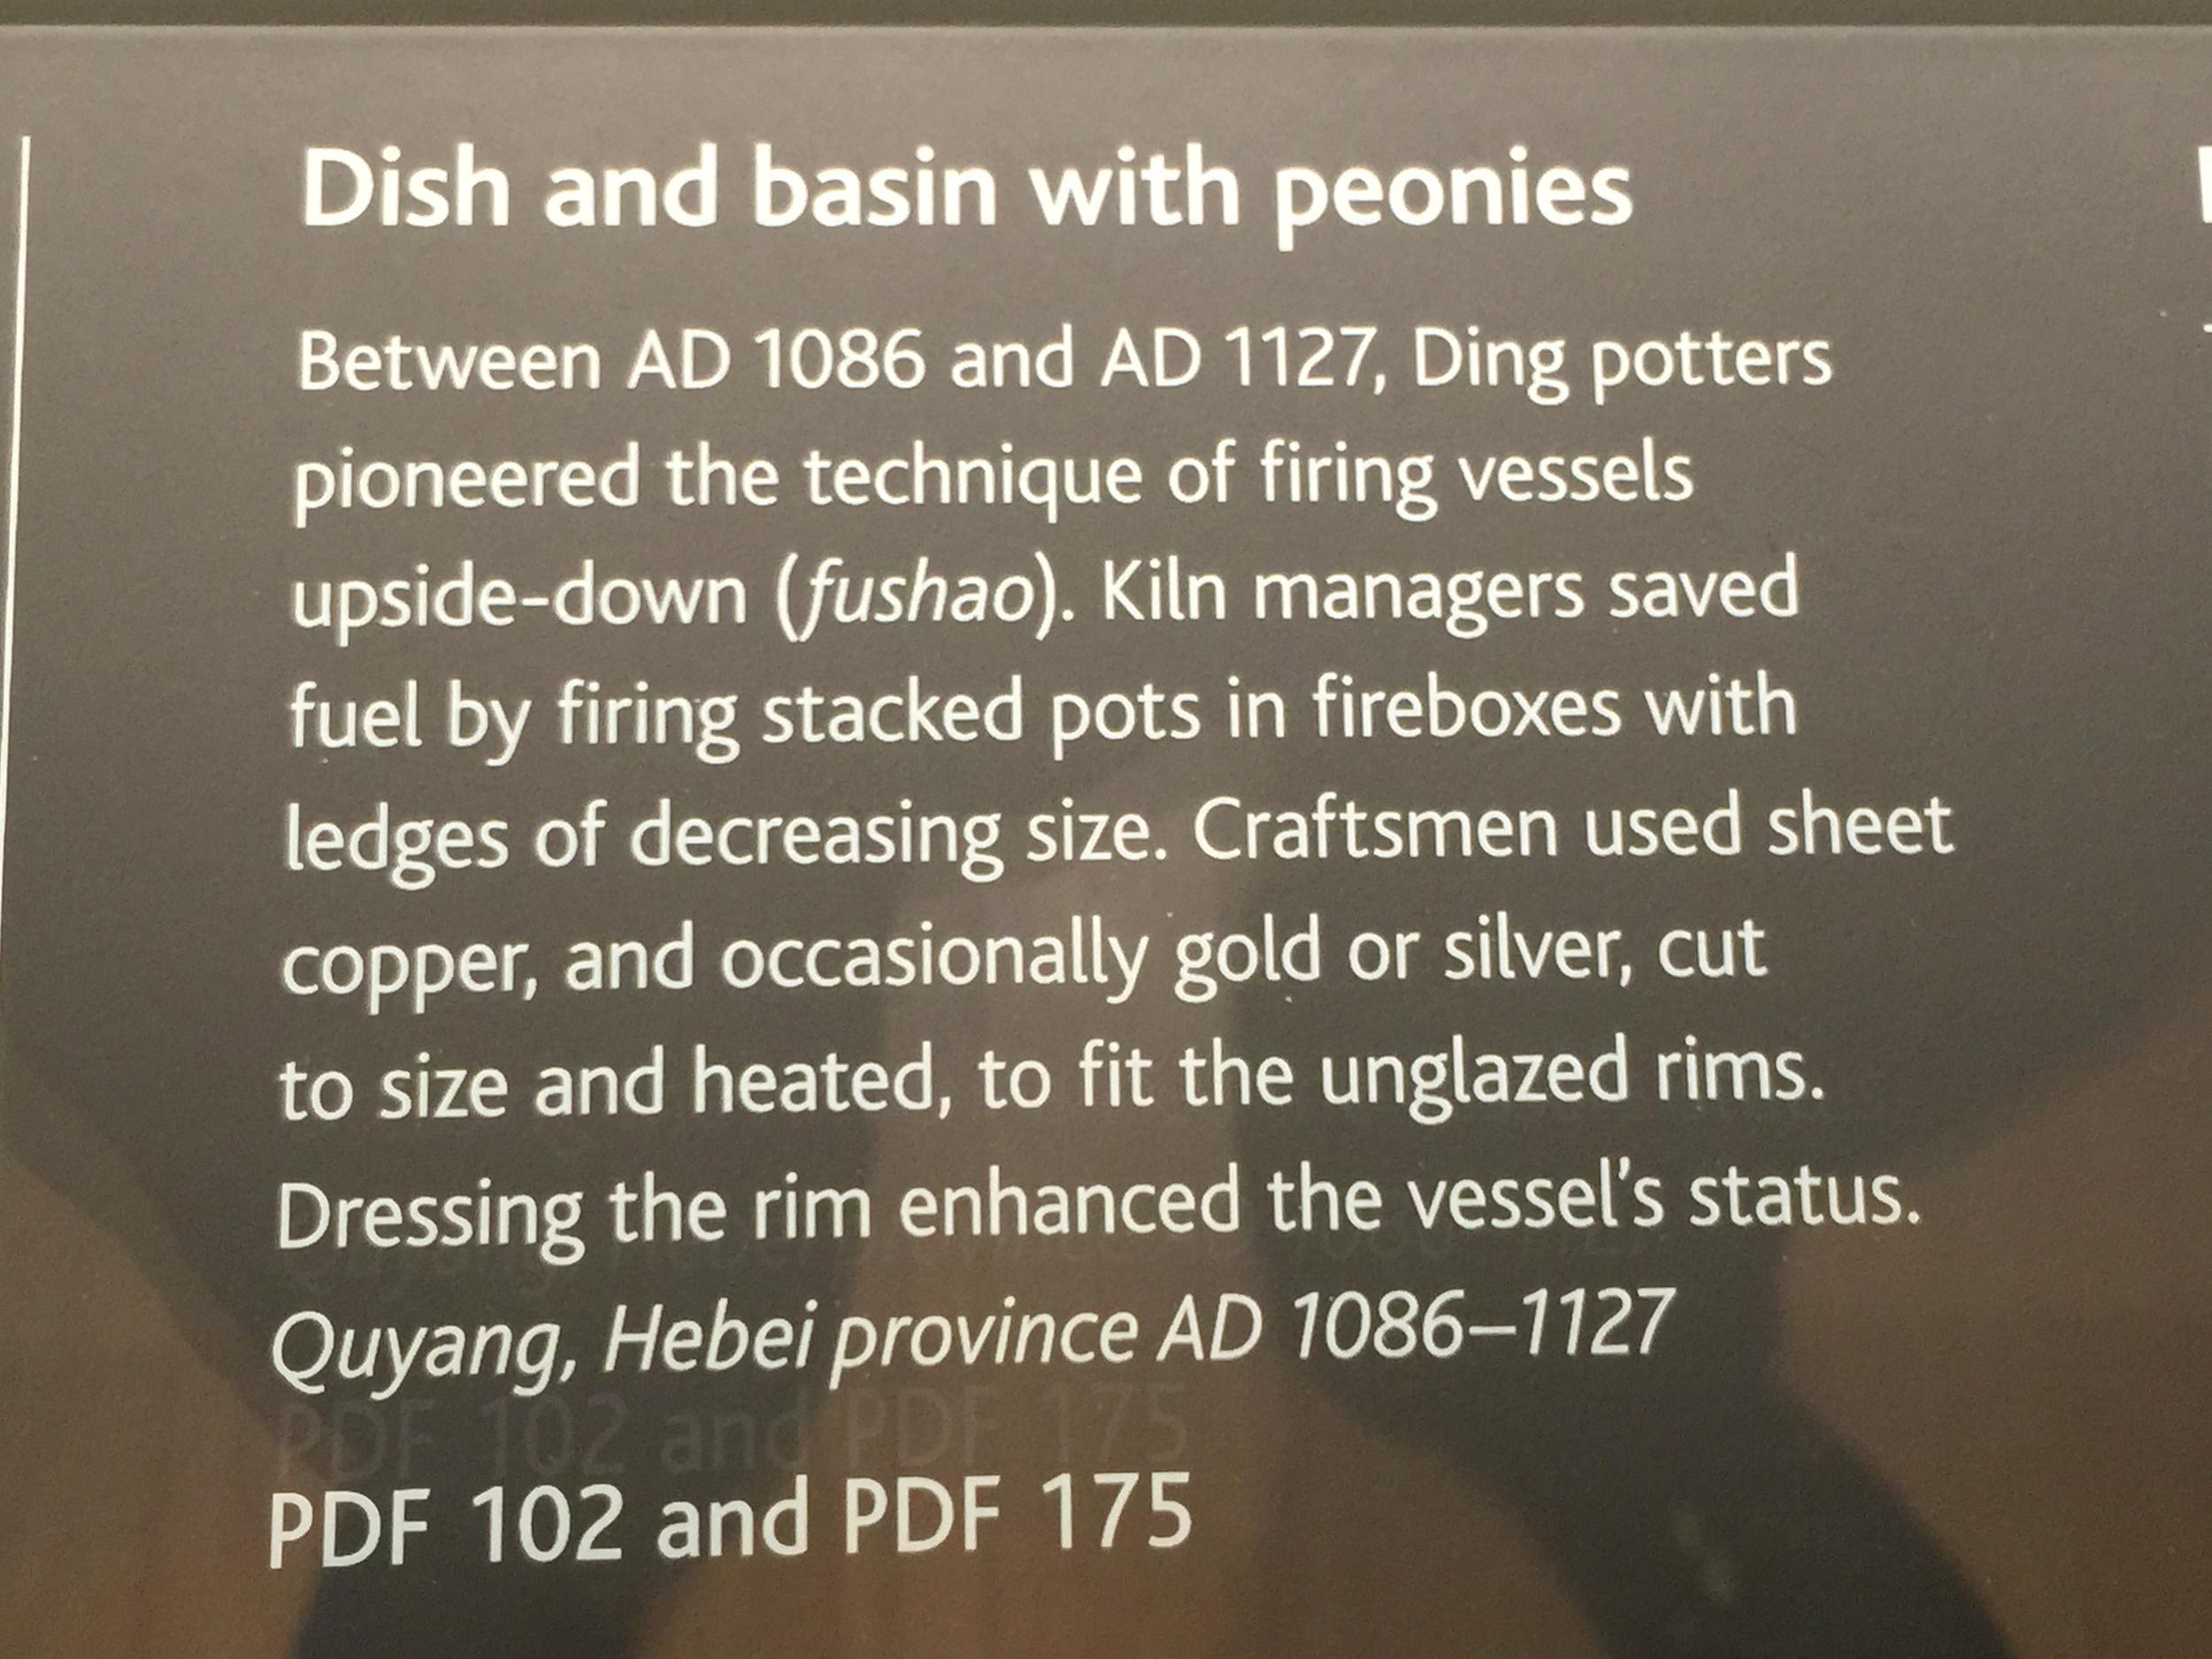 Chinese-Porcelain-British-Museum-Percival-David-jessewaugh.com-8.jpg